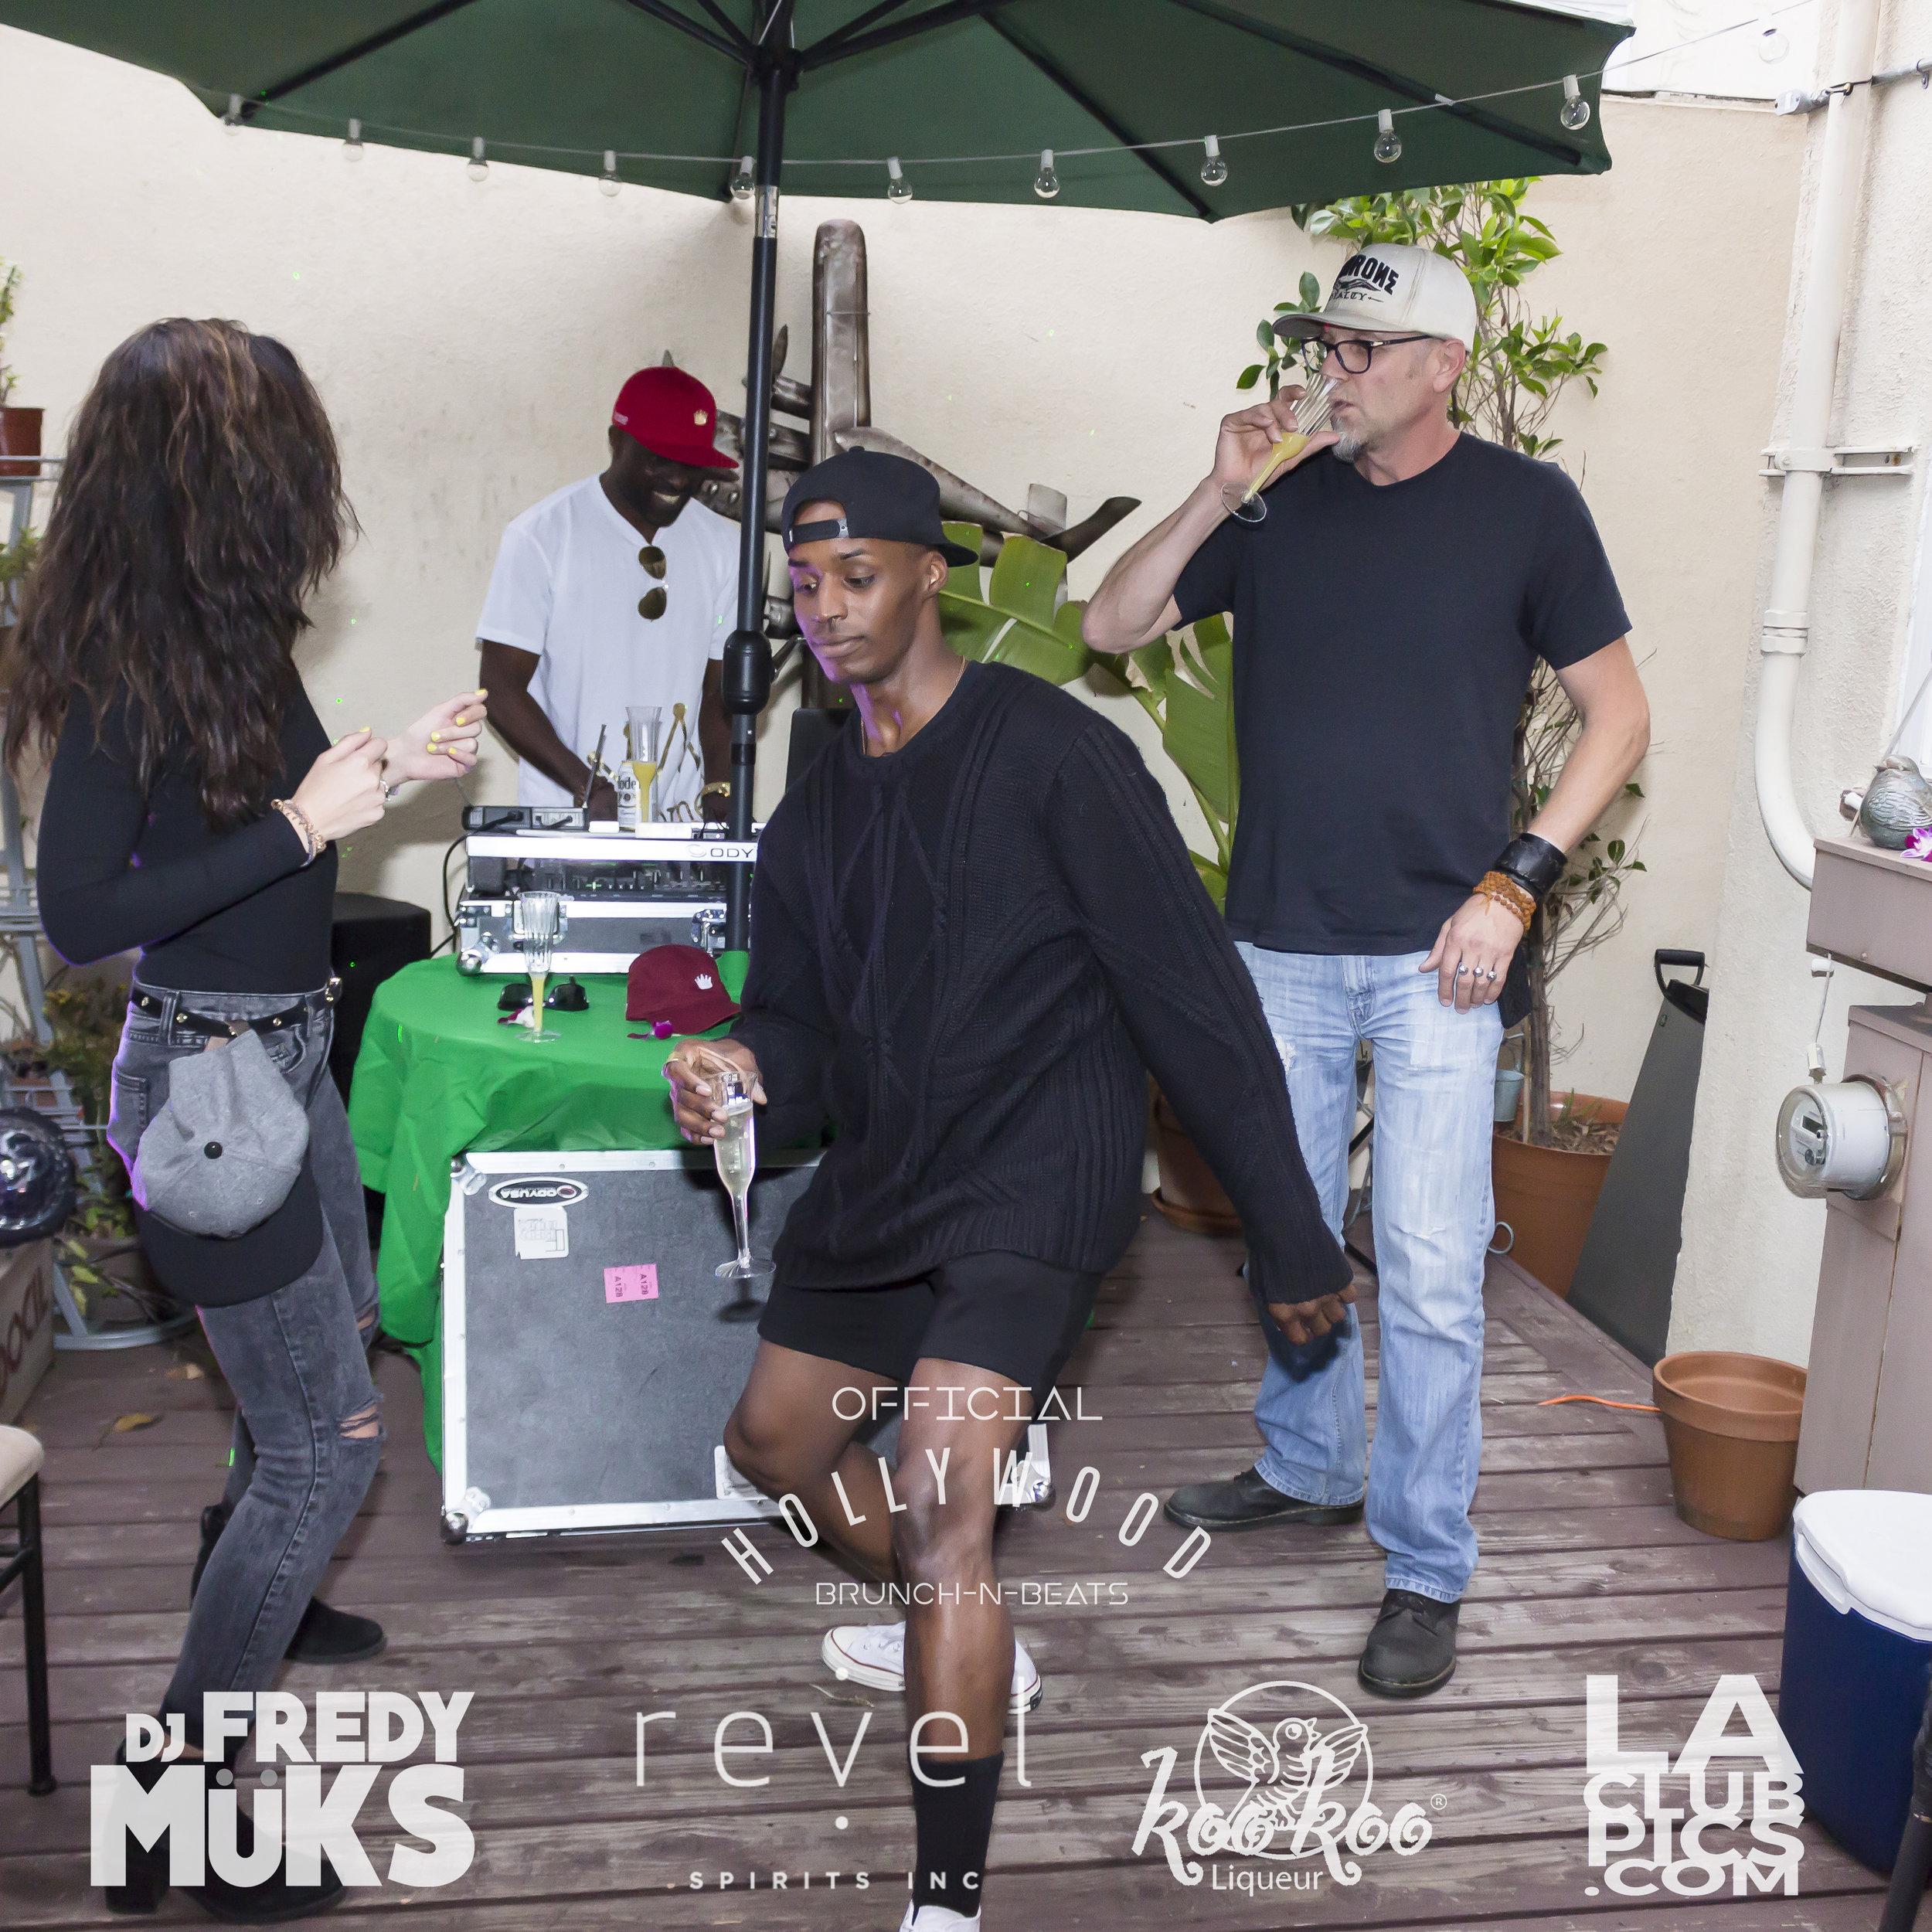 Hollywood Brunch-N-Beats - 03-18-18_240.jpg